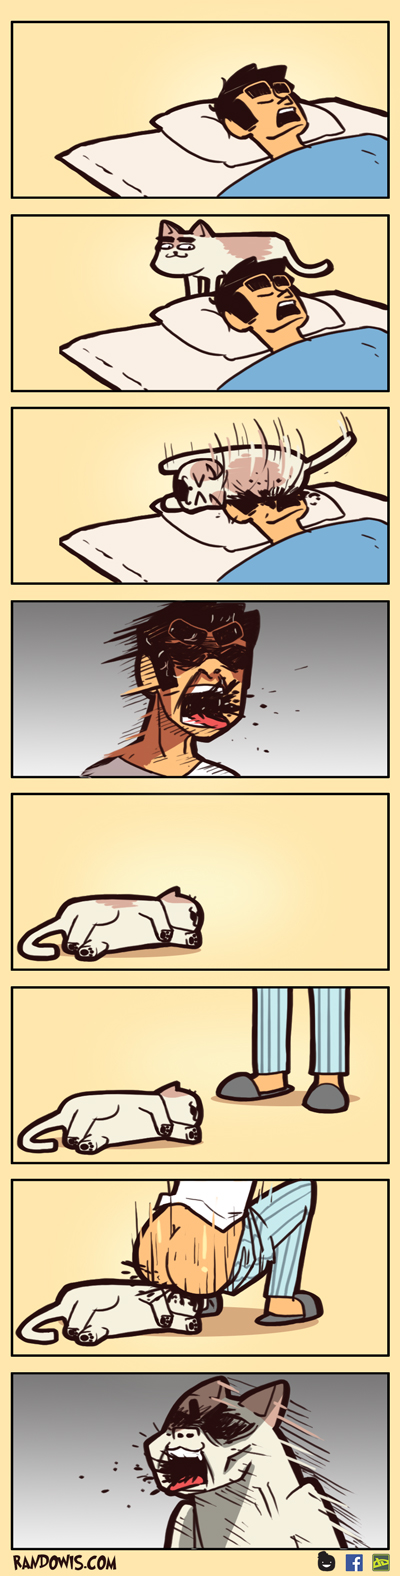 Cartoon by RandoWis.